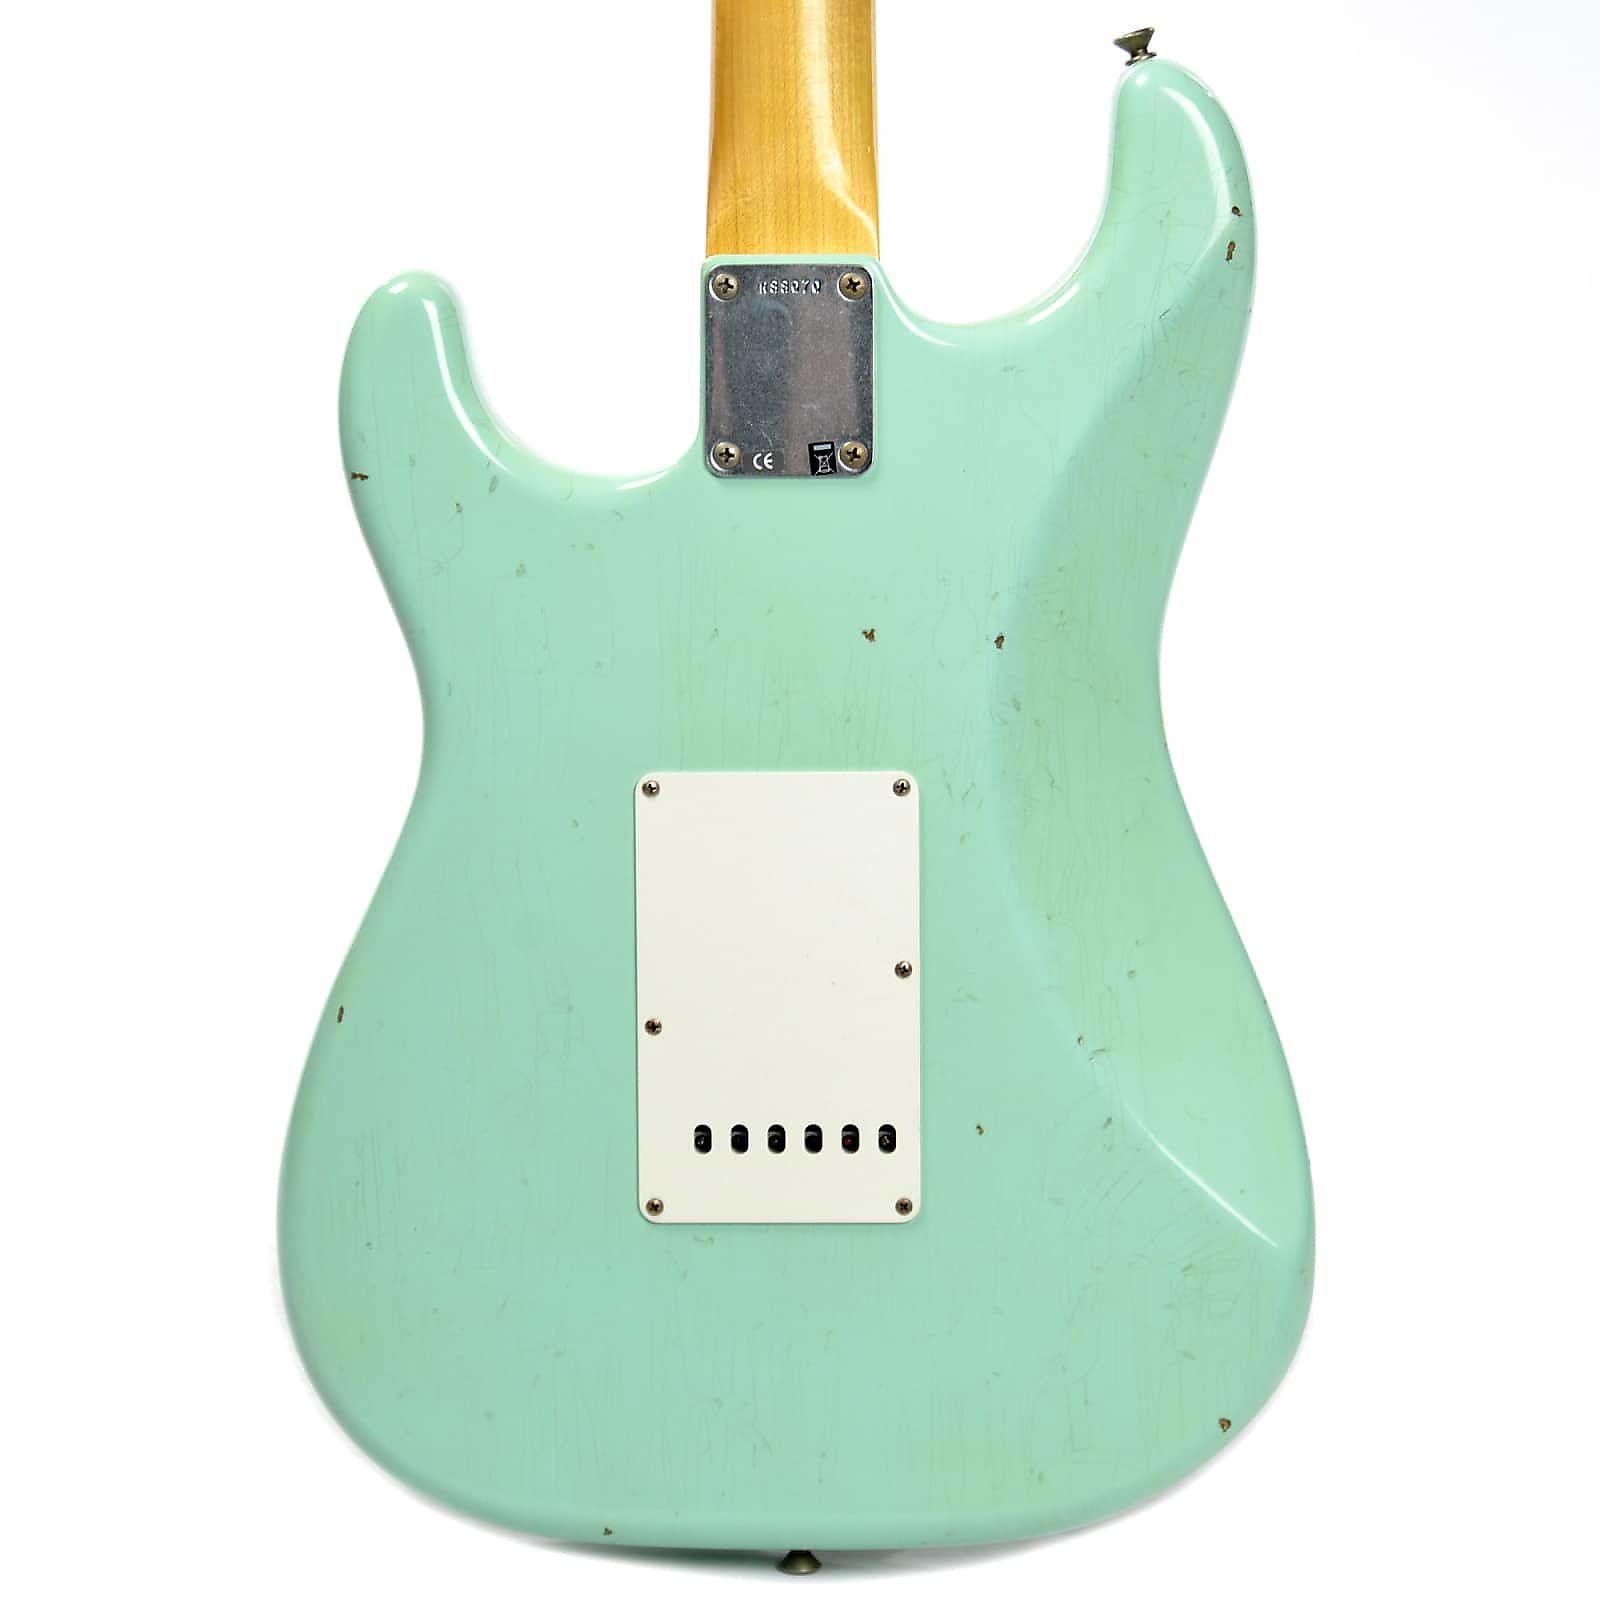 Fender Custom Shop 1960 Stratocaster Journeyman Relic RW Aged Surf ...